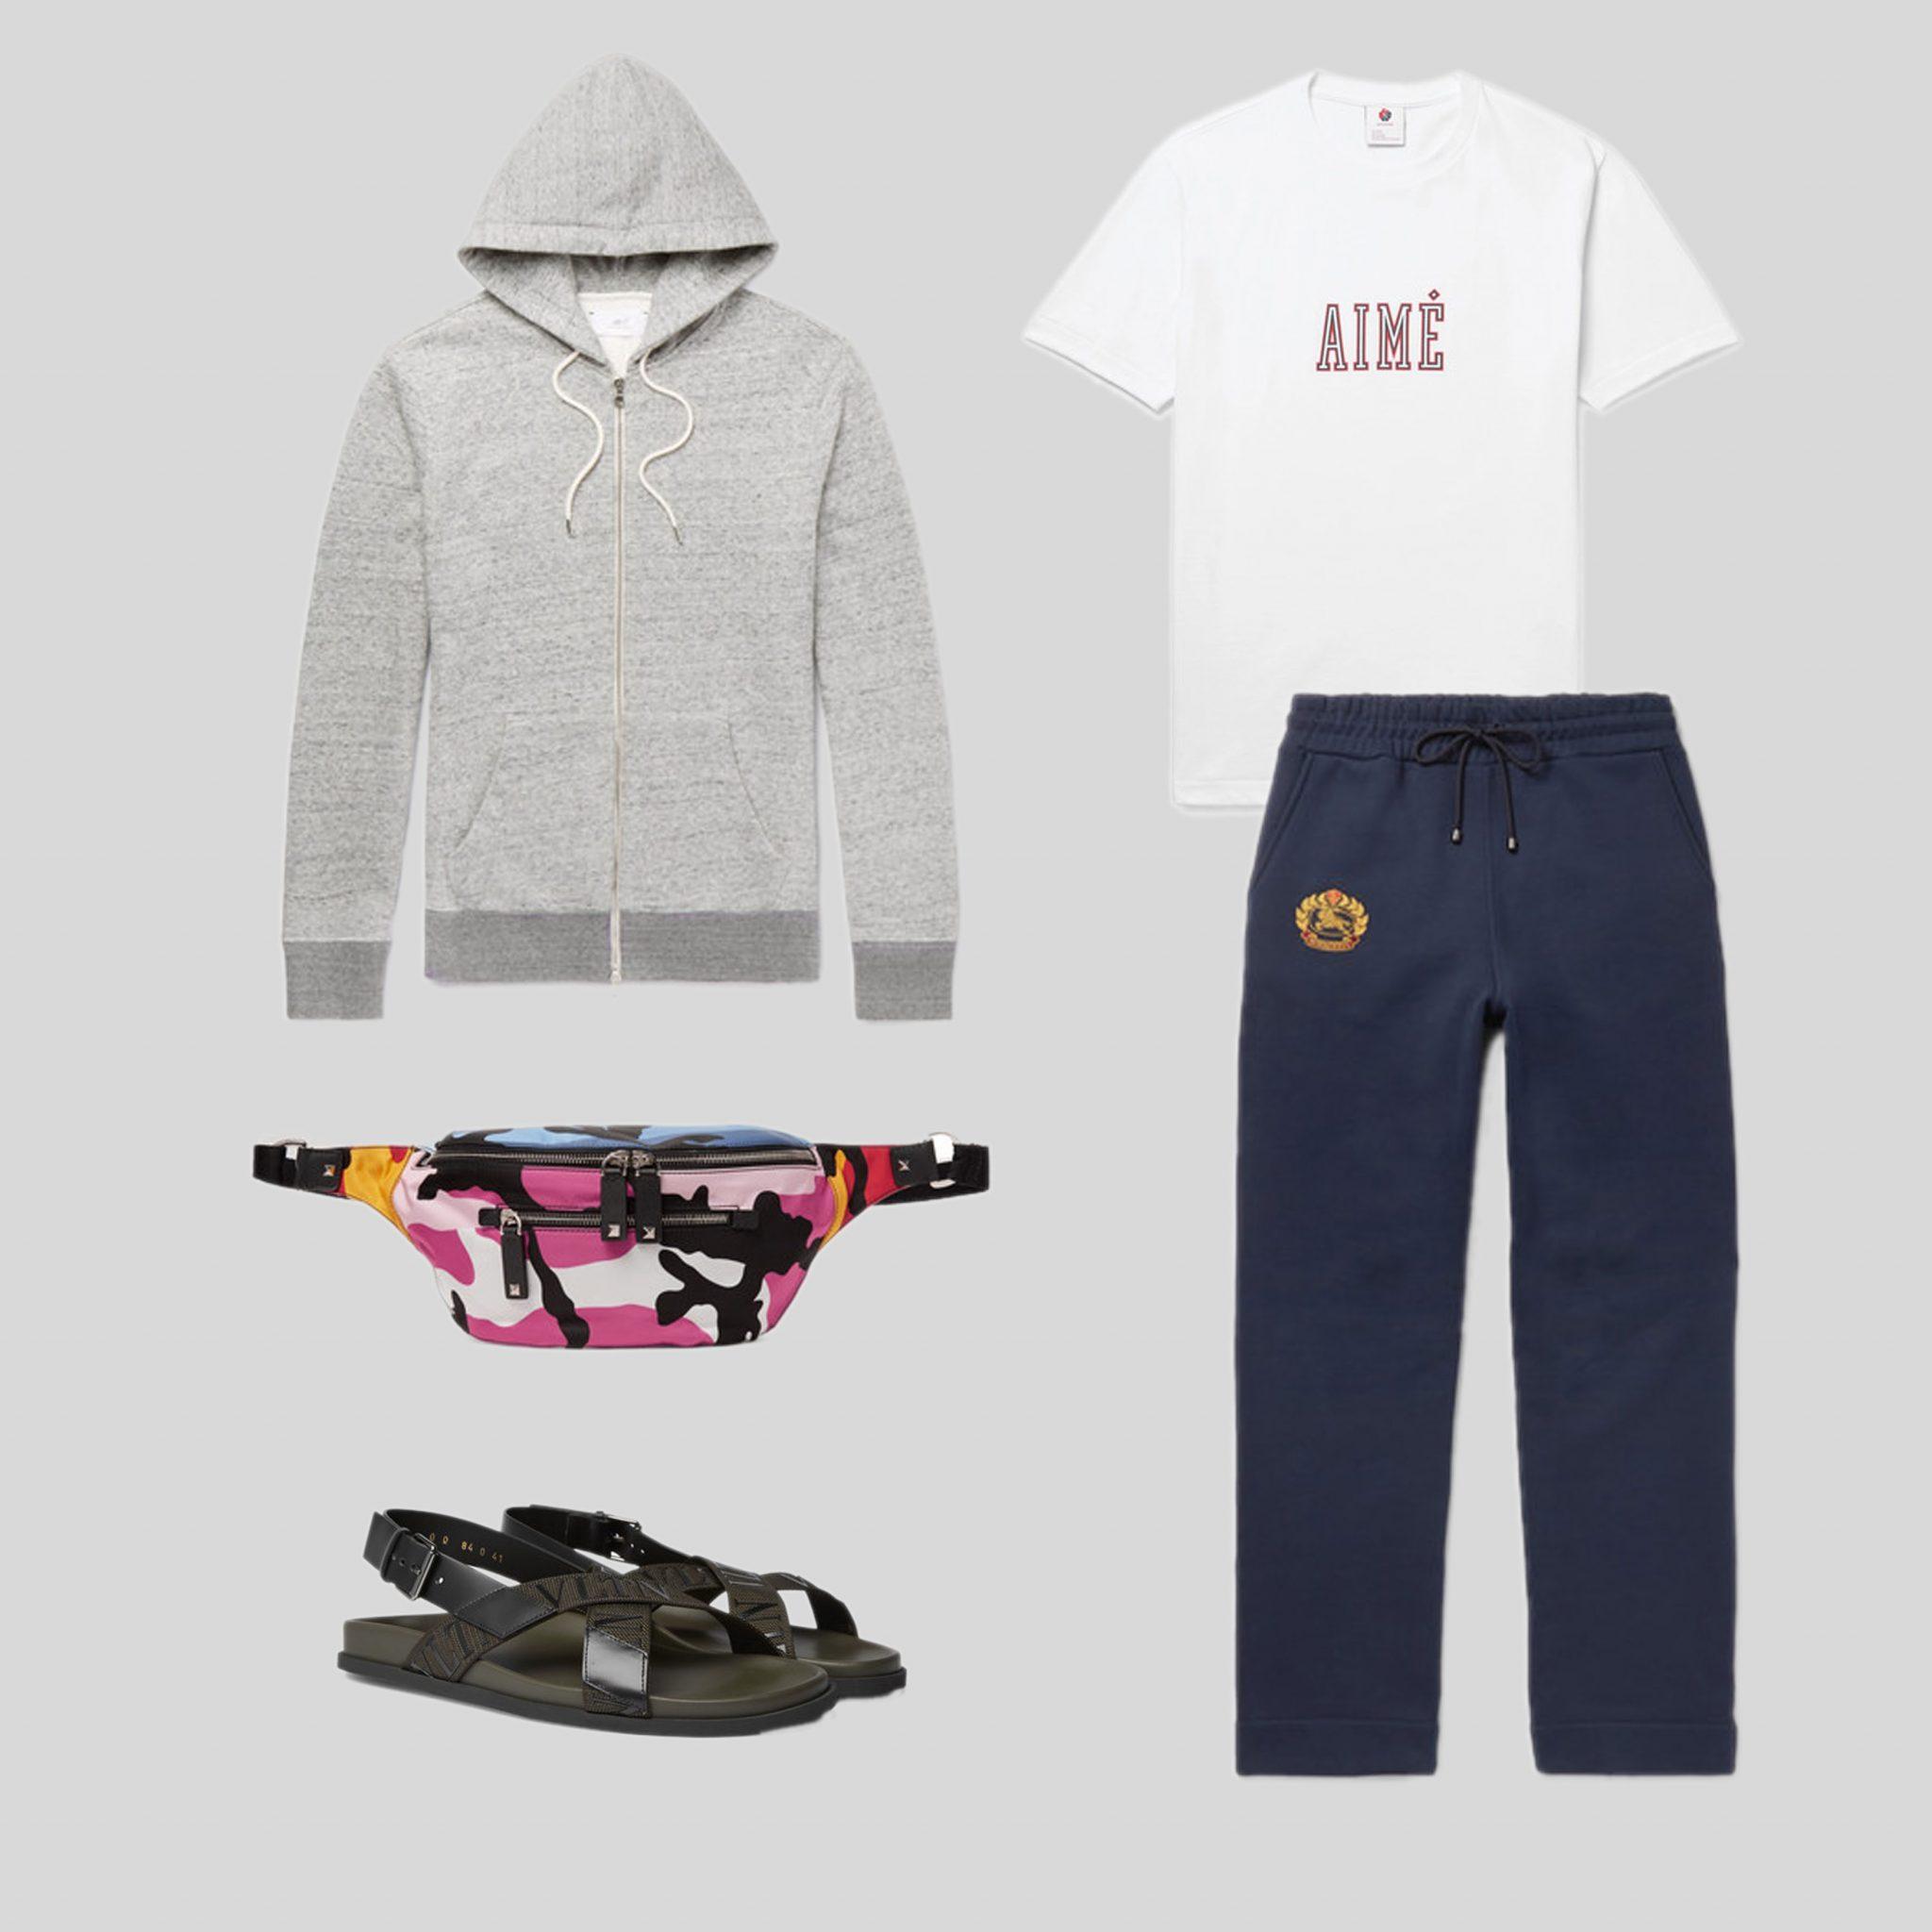 ELLE Man Style Calendar mix & match trang phục du lịch biển. (23)